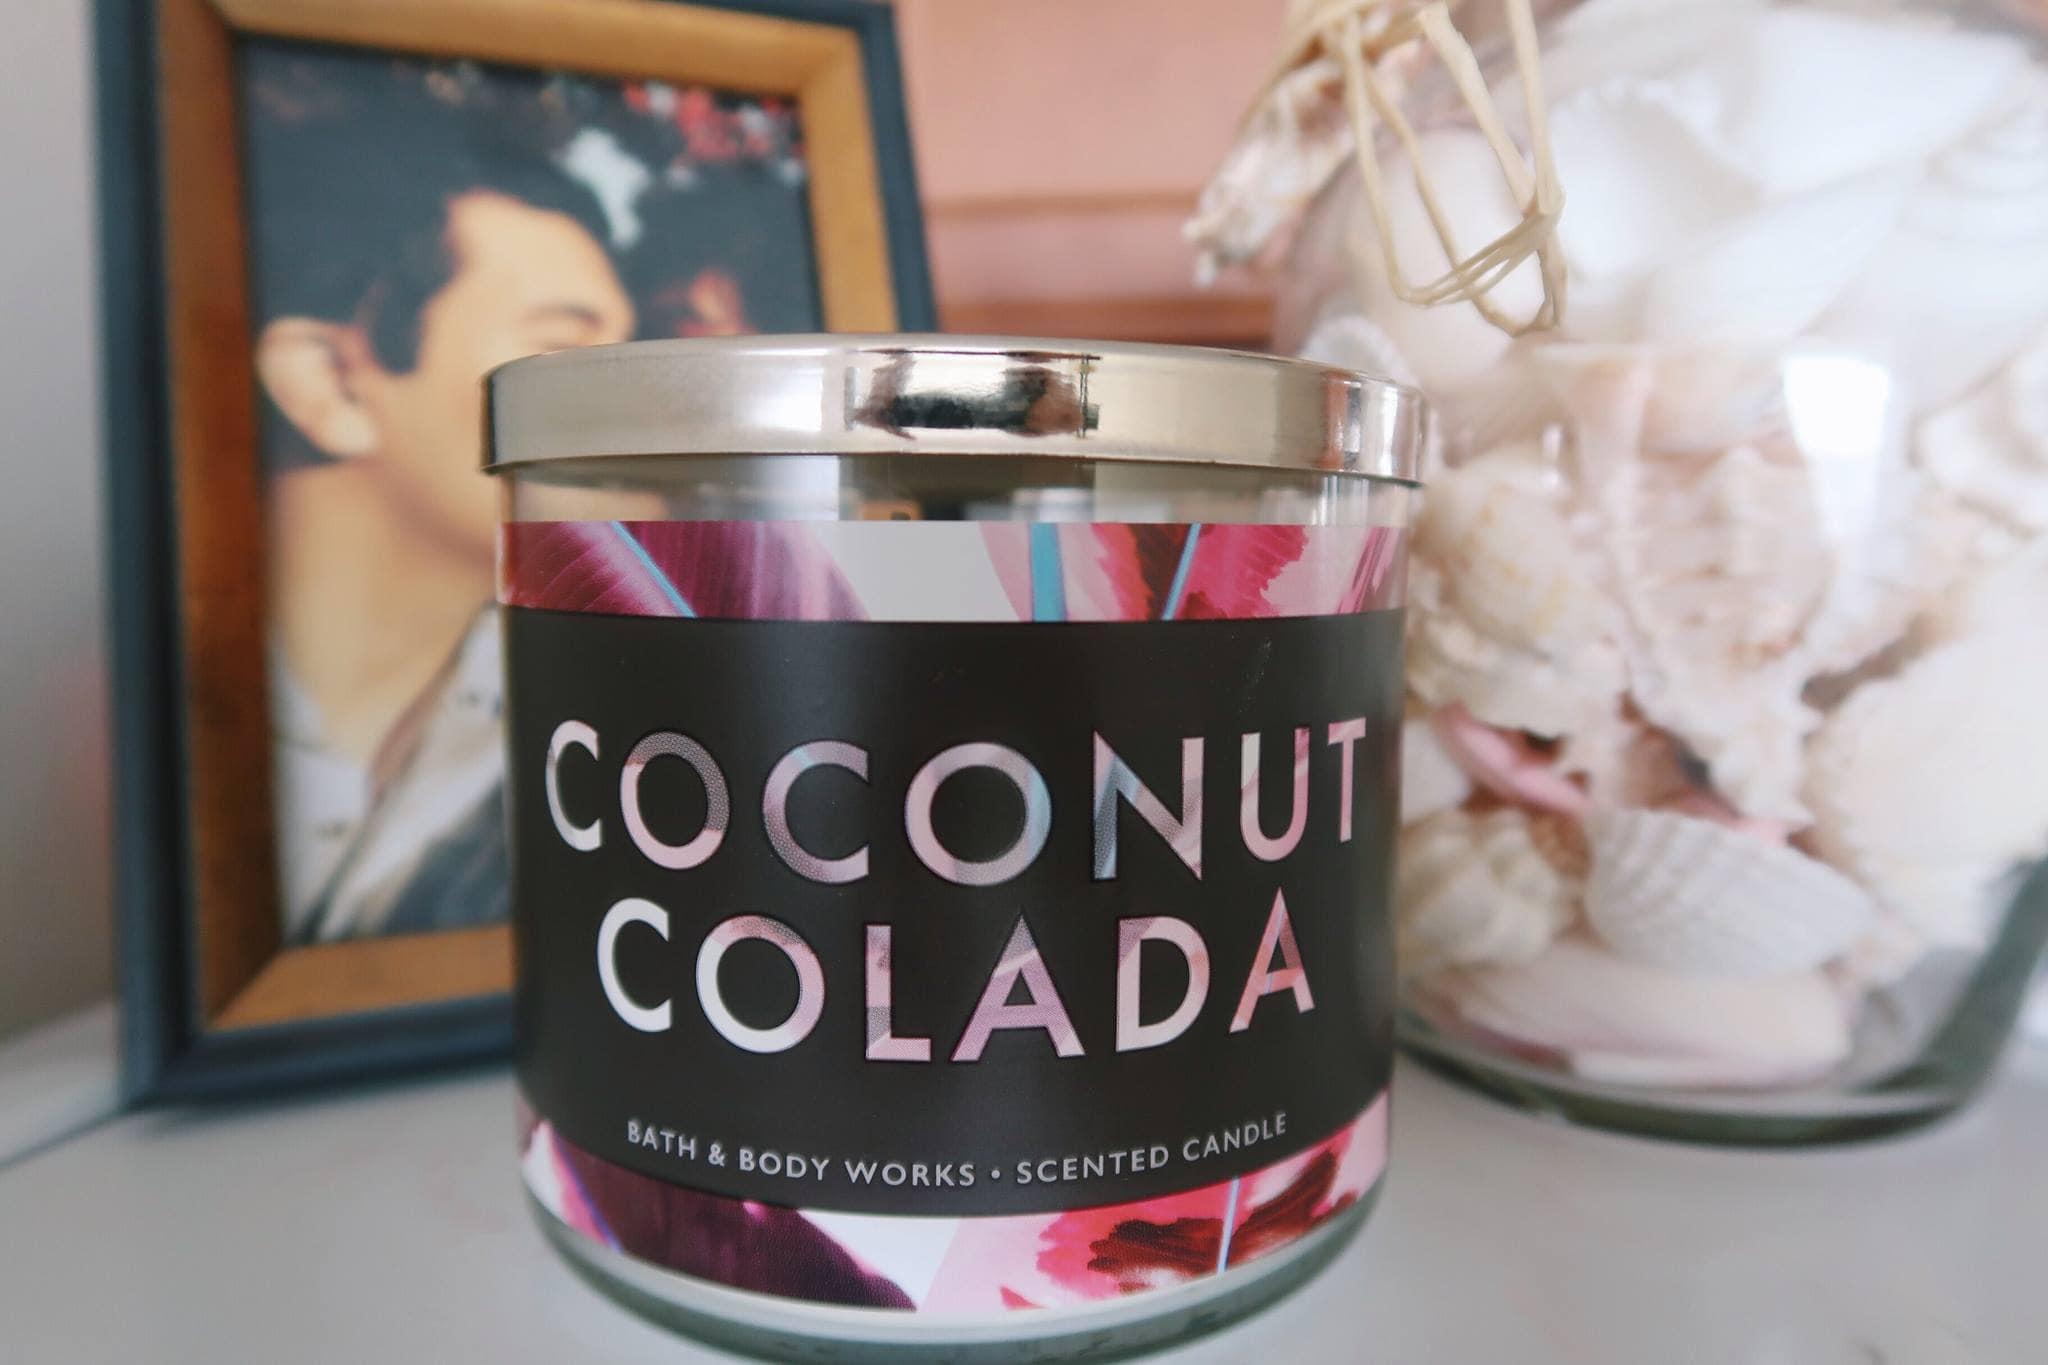 Bath & Body Works Coconut Colada Candle